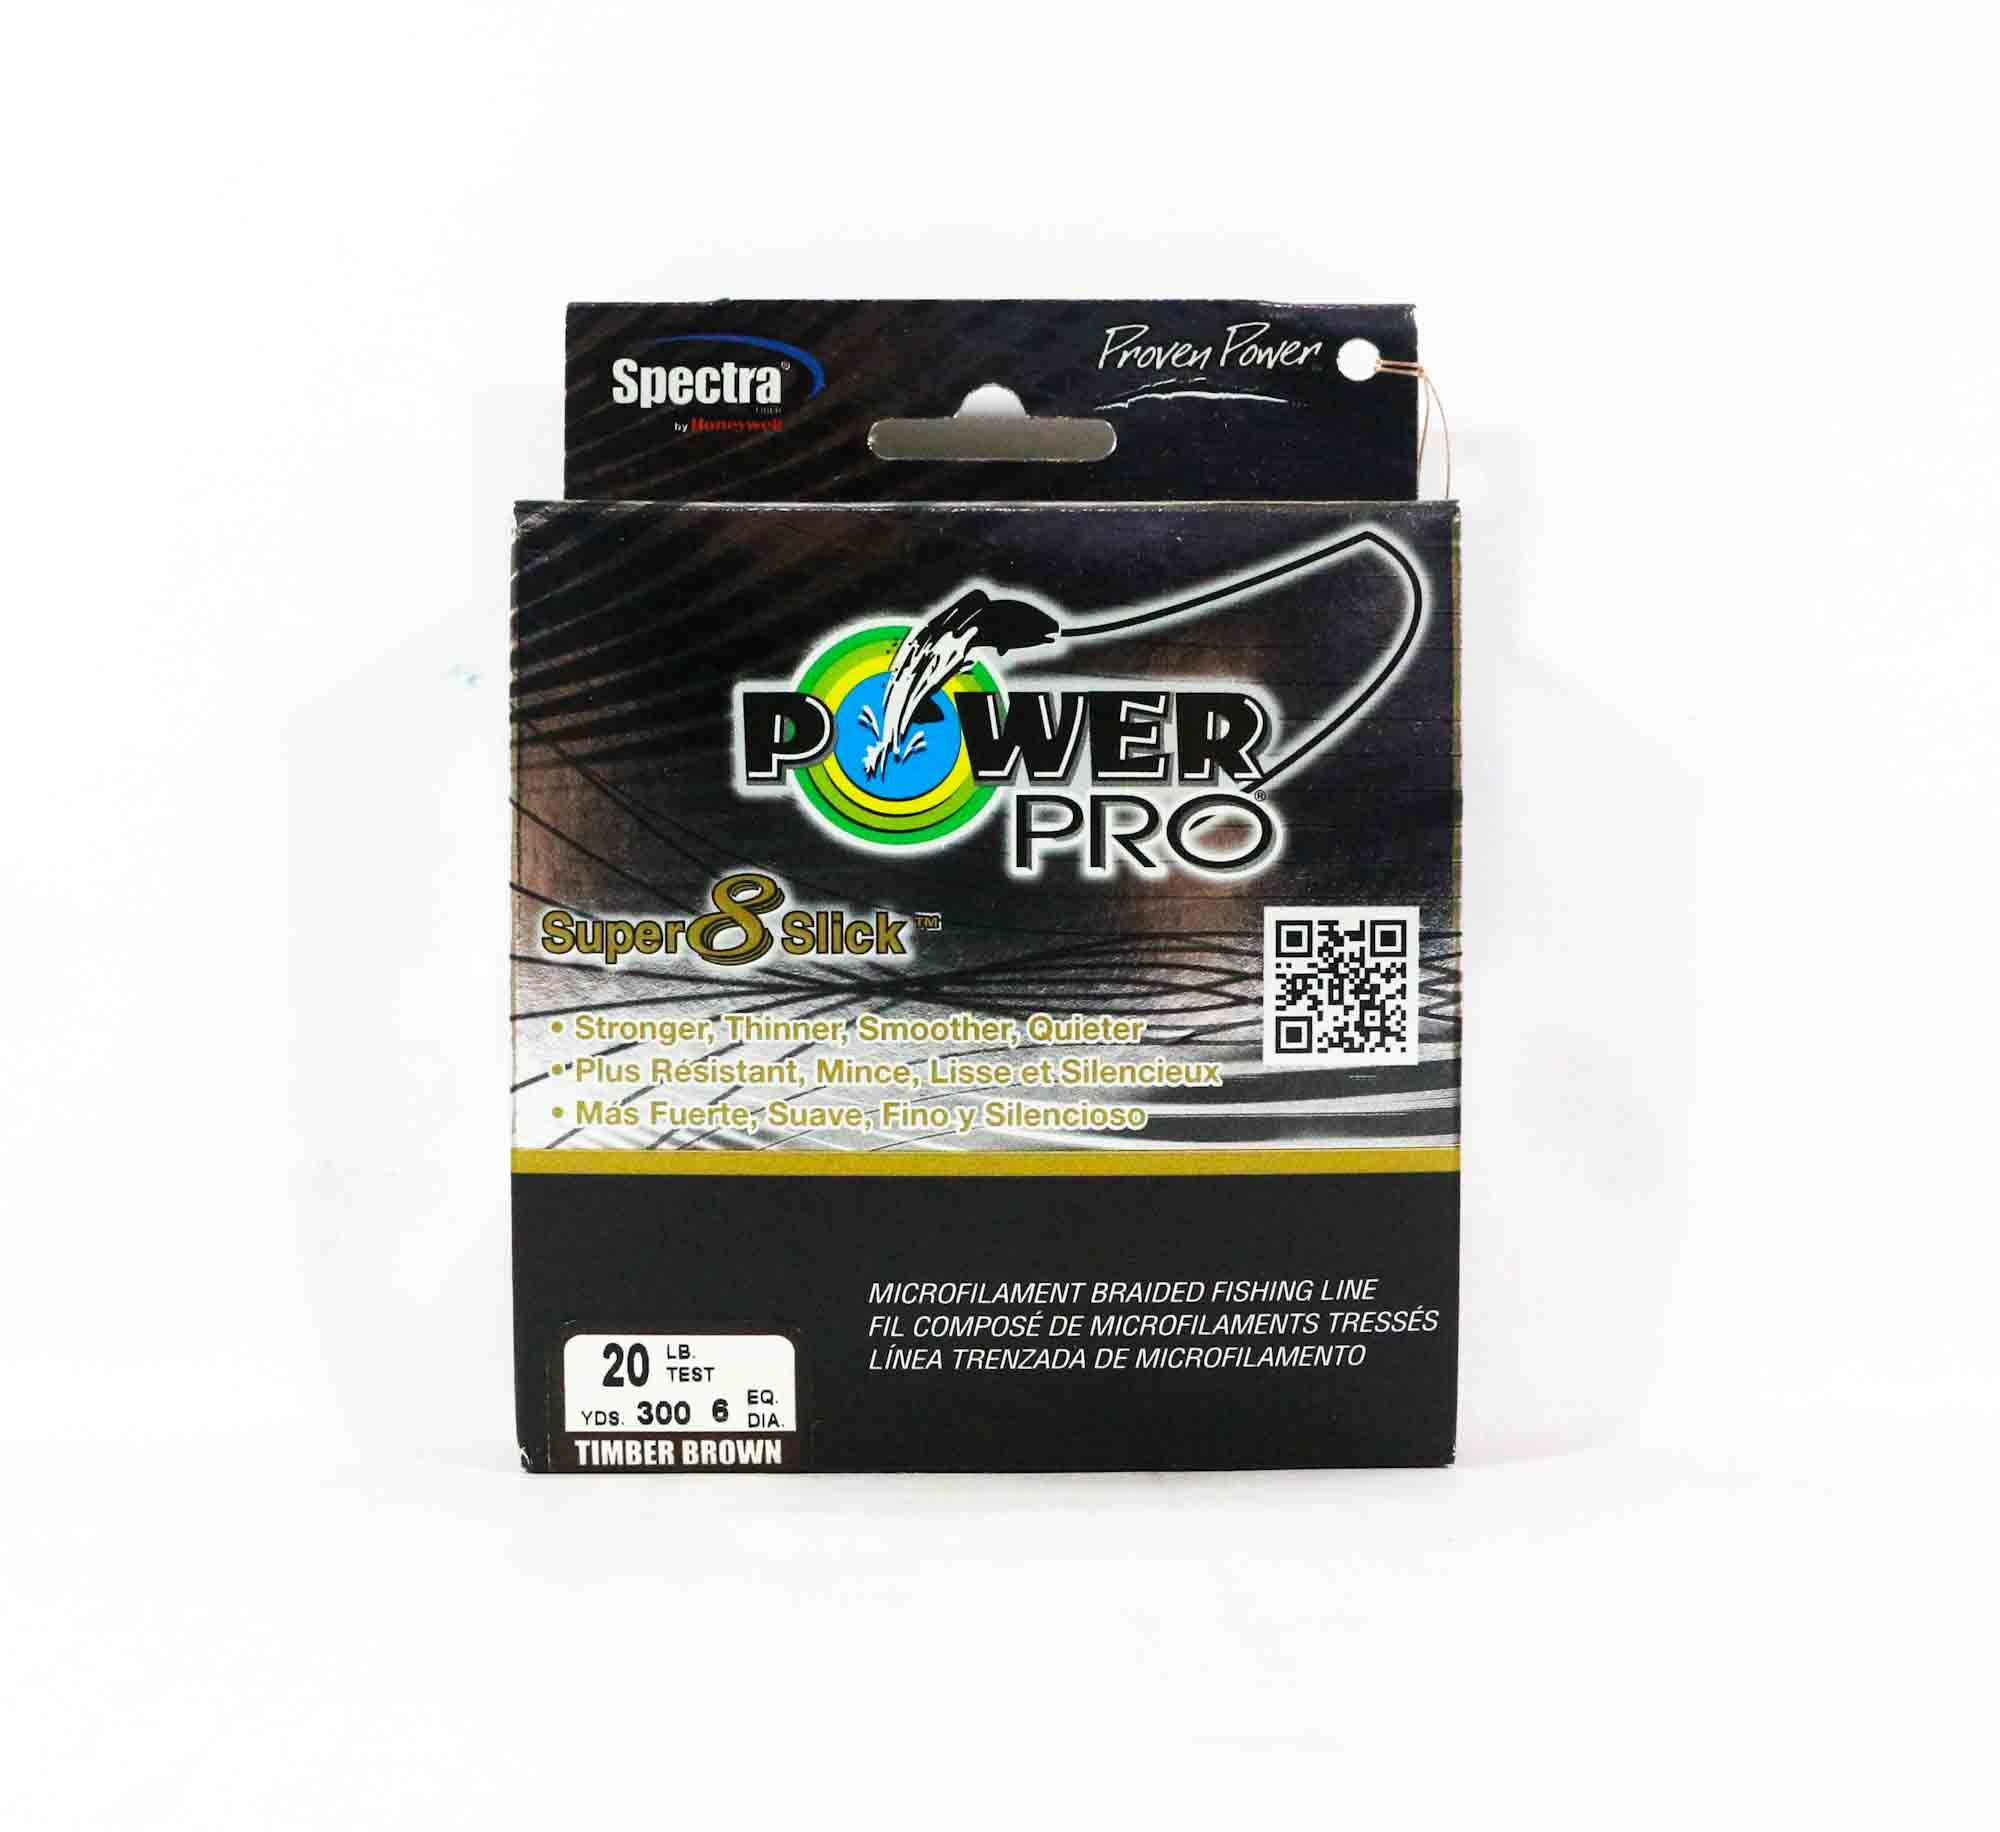 Power Pro Super 8 Slick Spectra Line 20lb by 300yds Brown (0473)